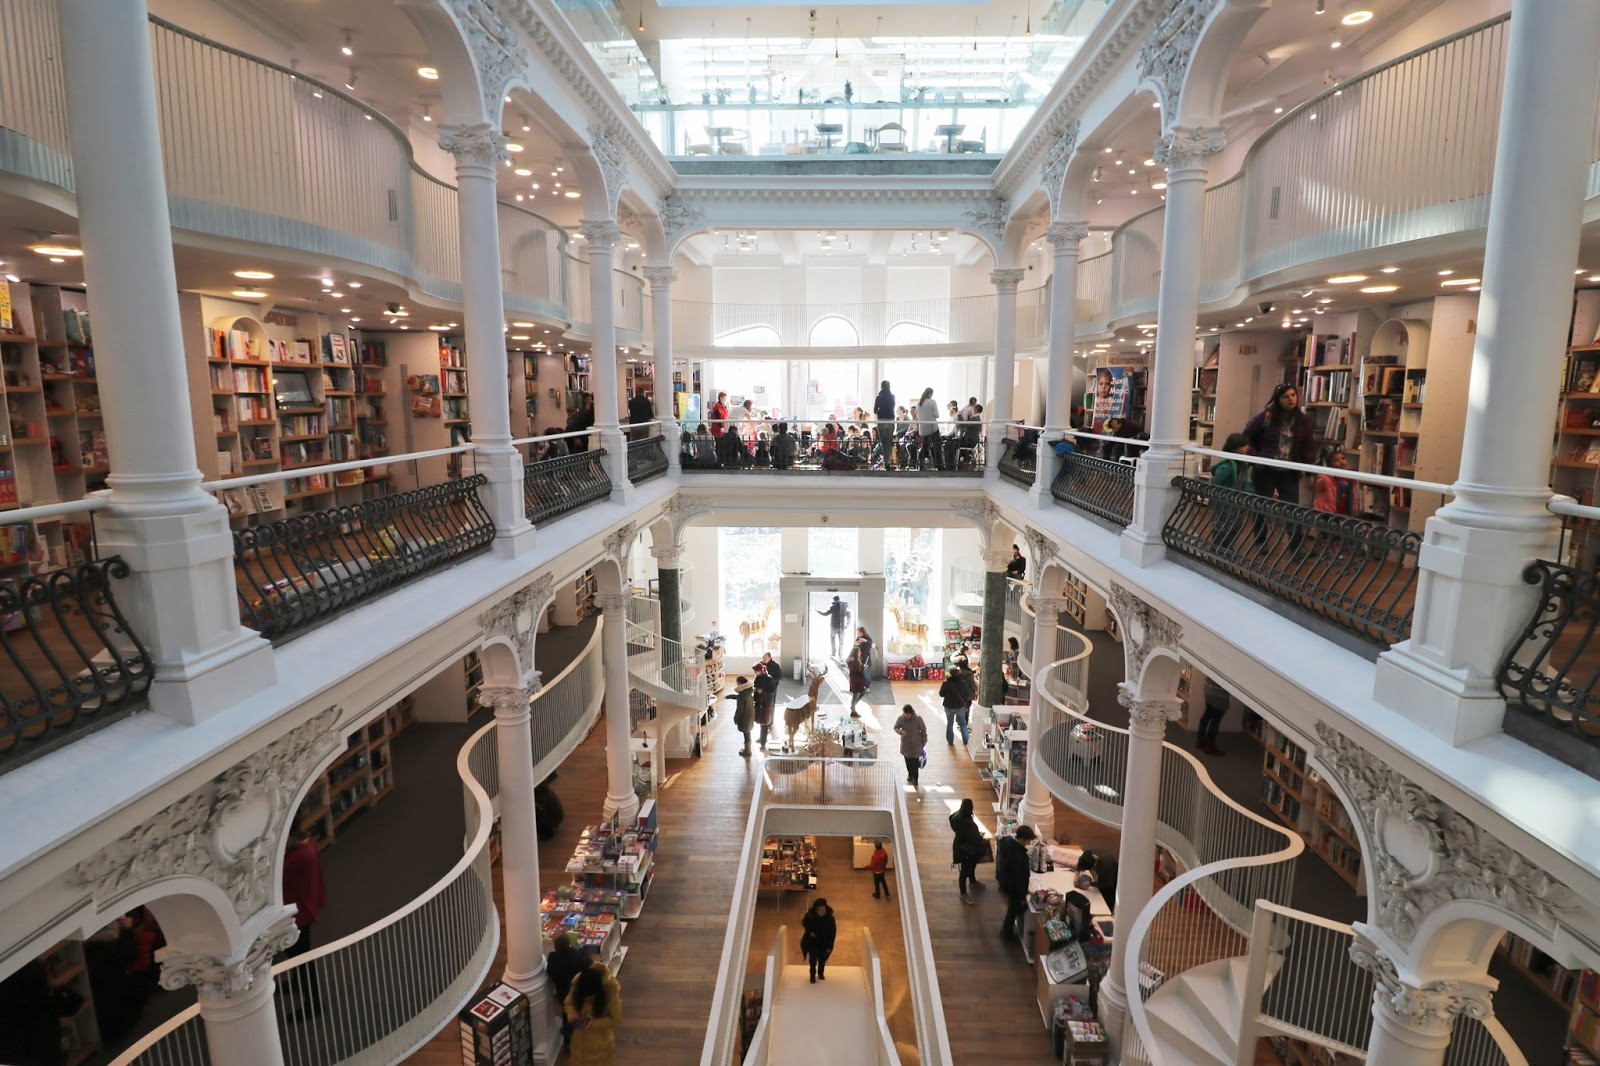 księgarnia bukareszt, bookstore bucharest